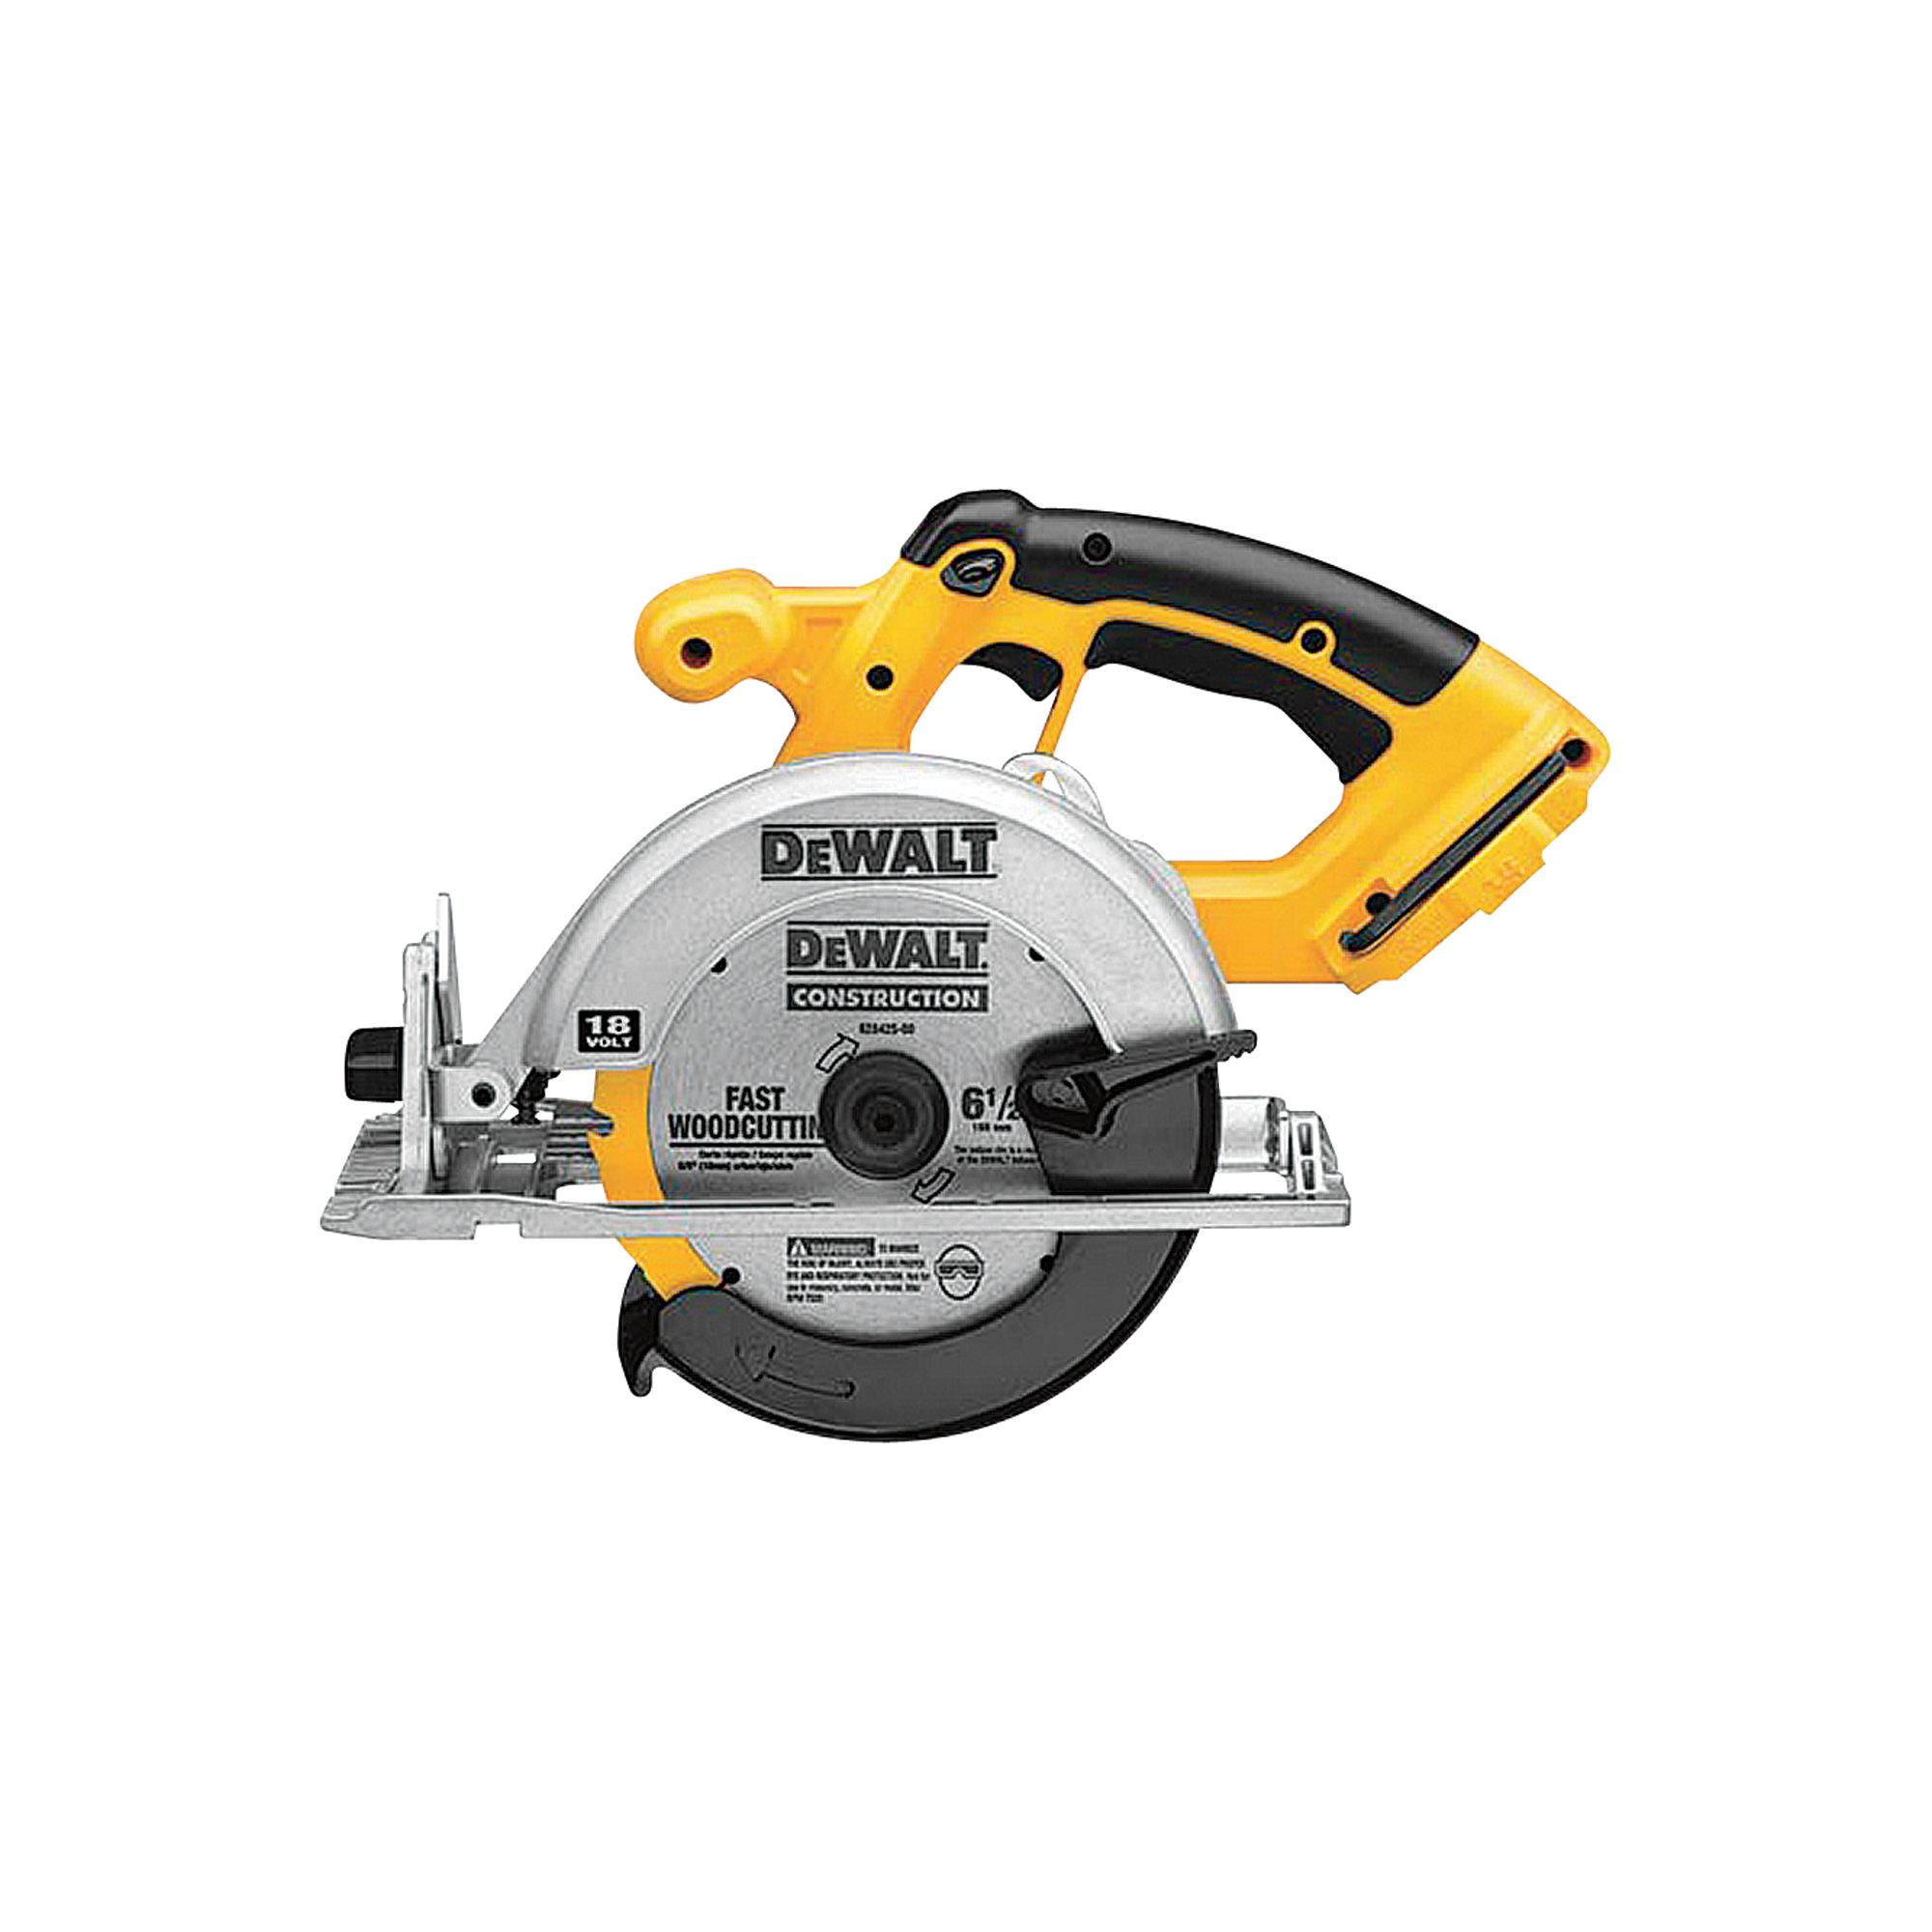 DEWALT Cordless Circular Saw — Tool Only, 18V, 6 1/2in. Blade ...